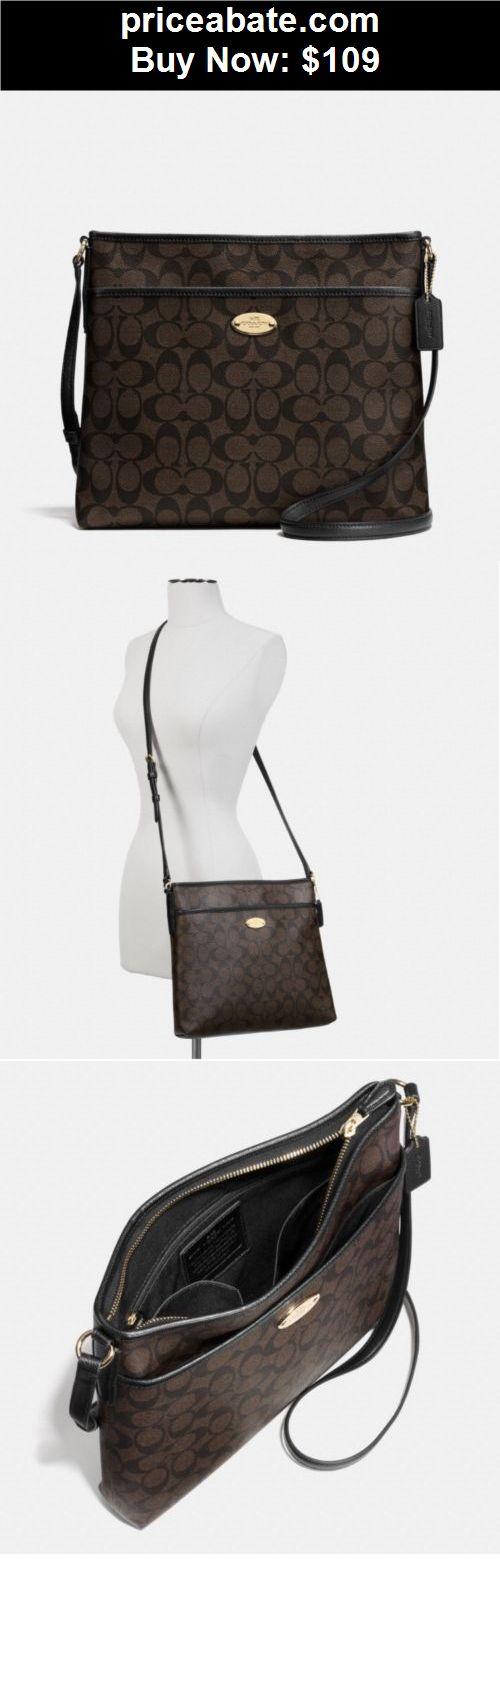 Women-Handbags-and-Purses: NWT COACH BROWN/BLACK SIGNATURE LEATHER CROSSBODY SHOULDER HANDBAG BAG PURSE - BUY IT NOW ONLY $109